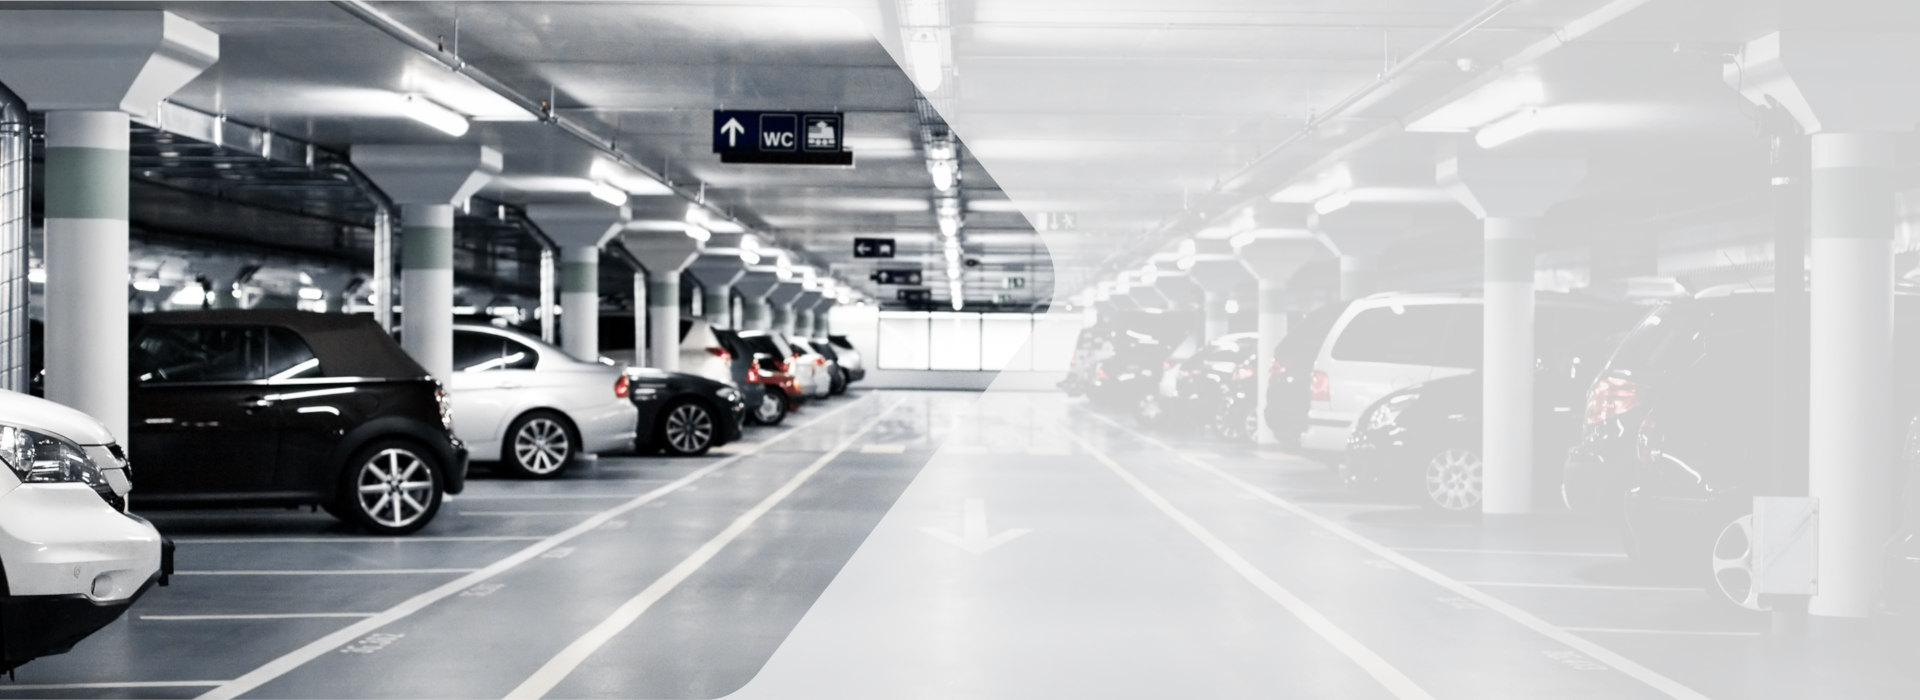 Parking Management Market is Booming Worldwide with Conduent, Indigo, Amano, Swarco, Skidata